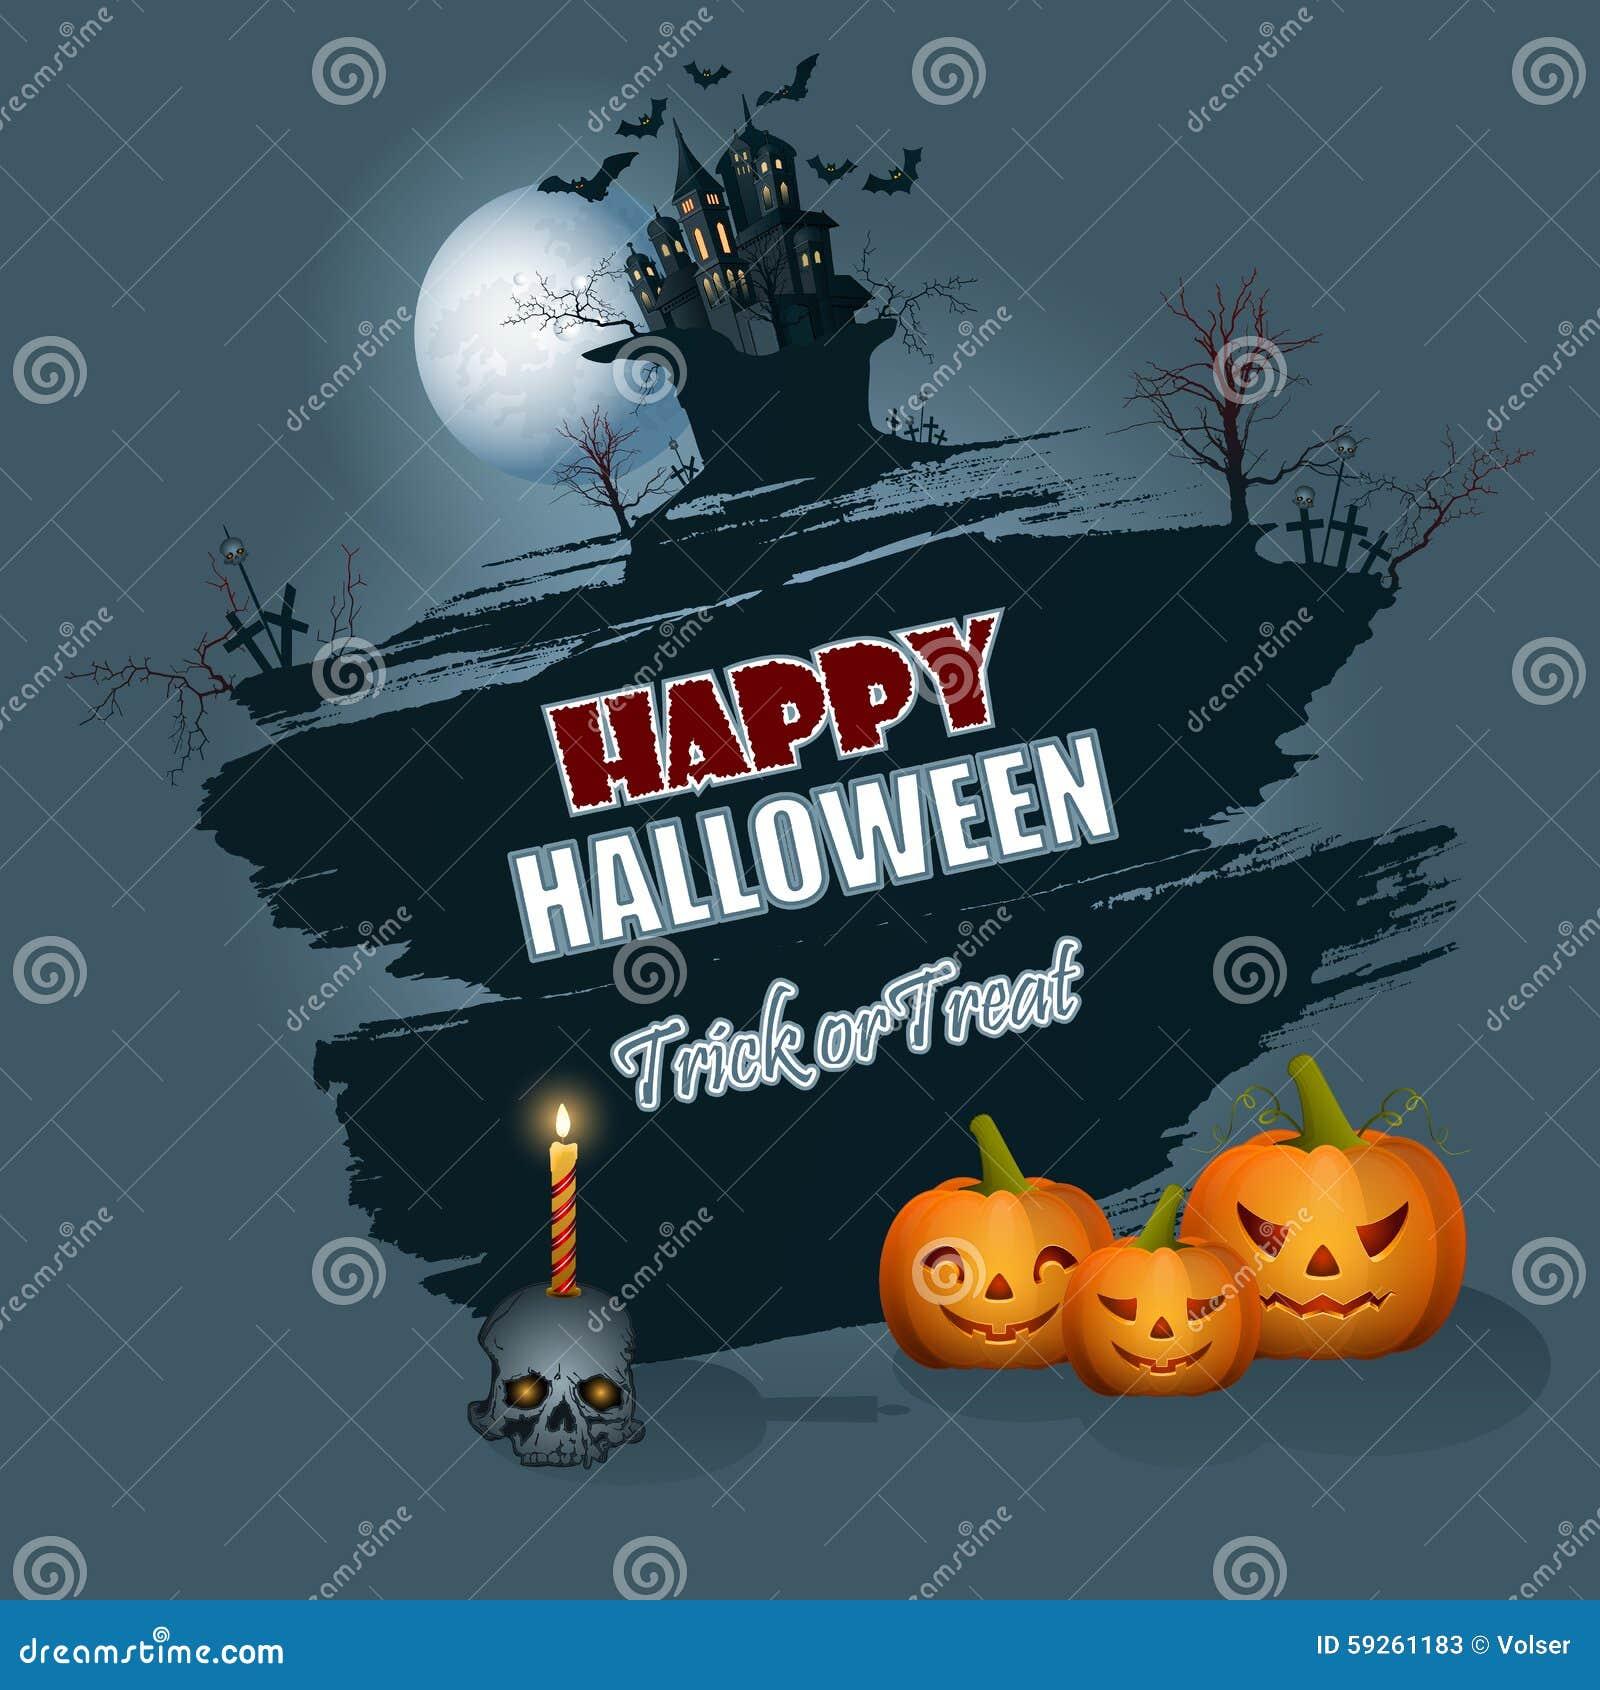 happy halloween message; background with moonlight scene stock